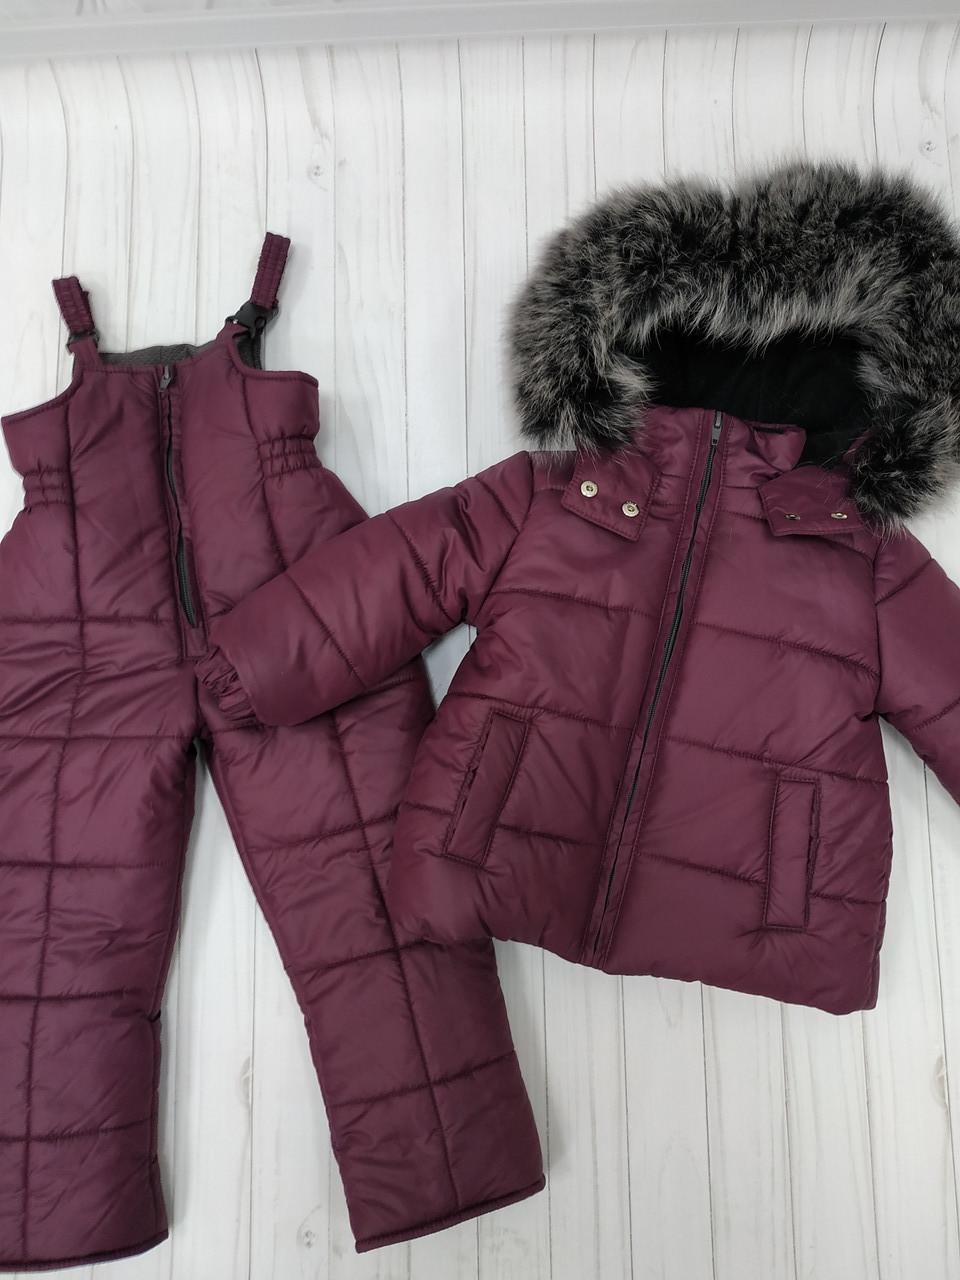 Зимний костюм для деток курточка + полукомбинезон  Бордо